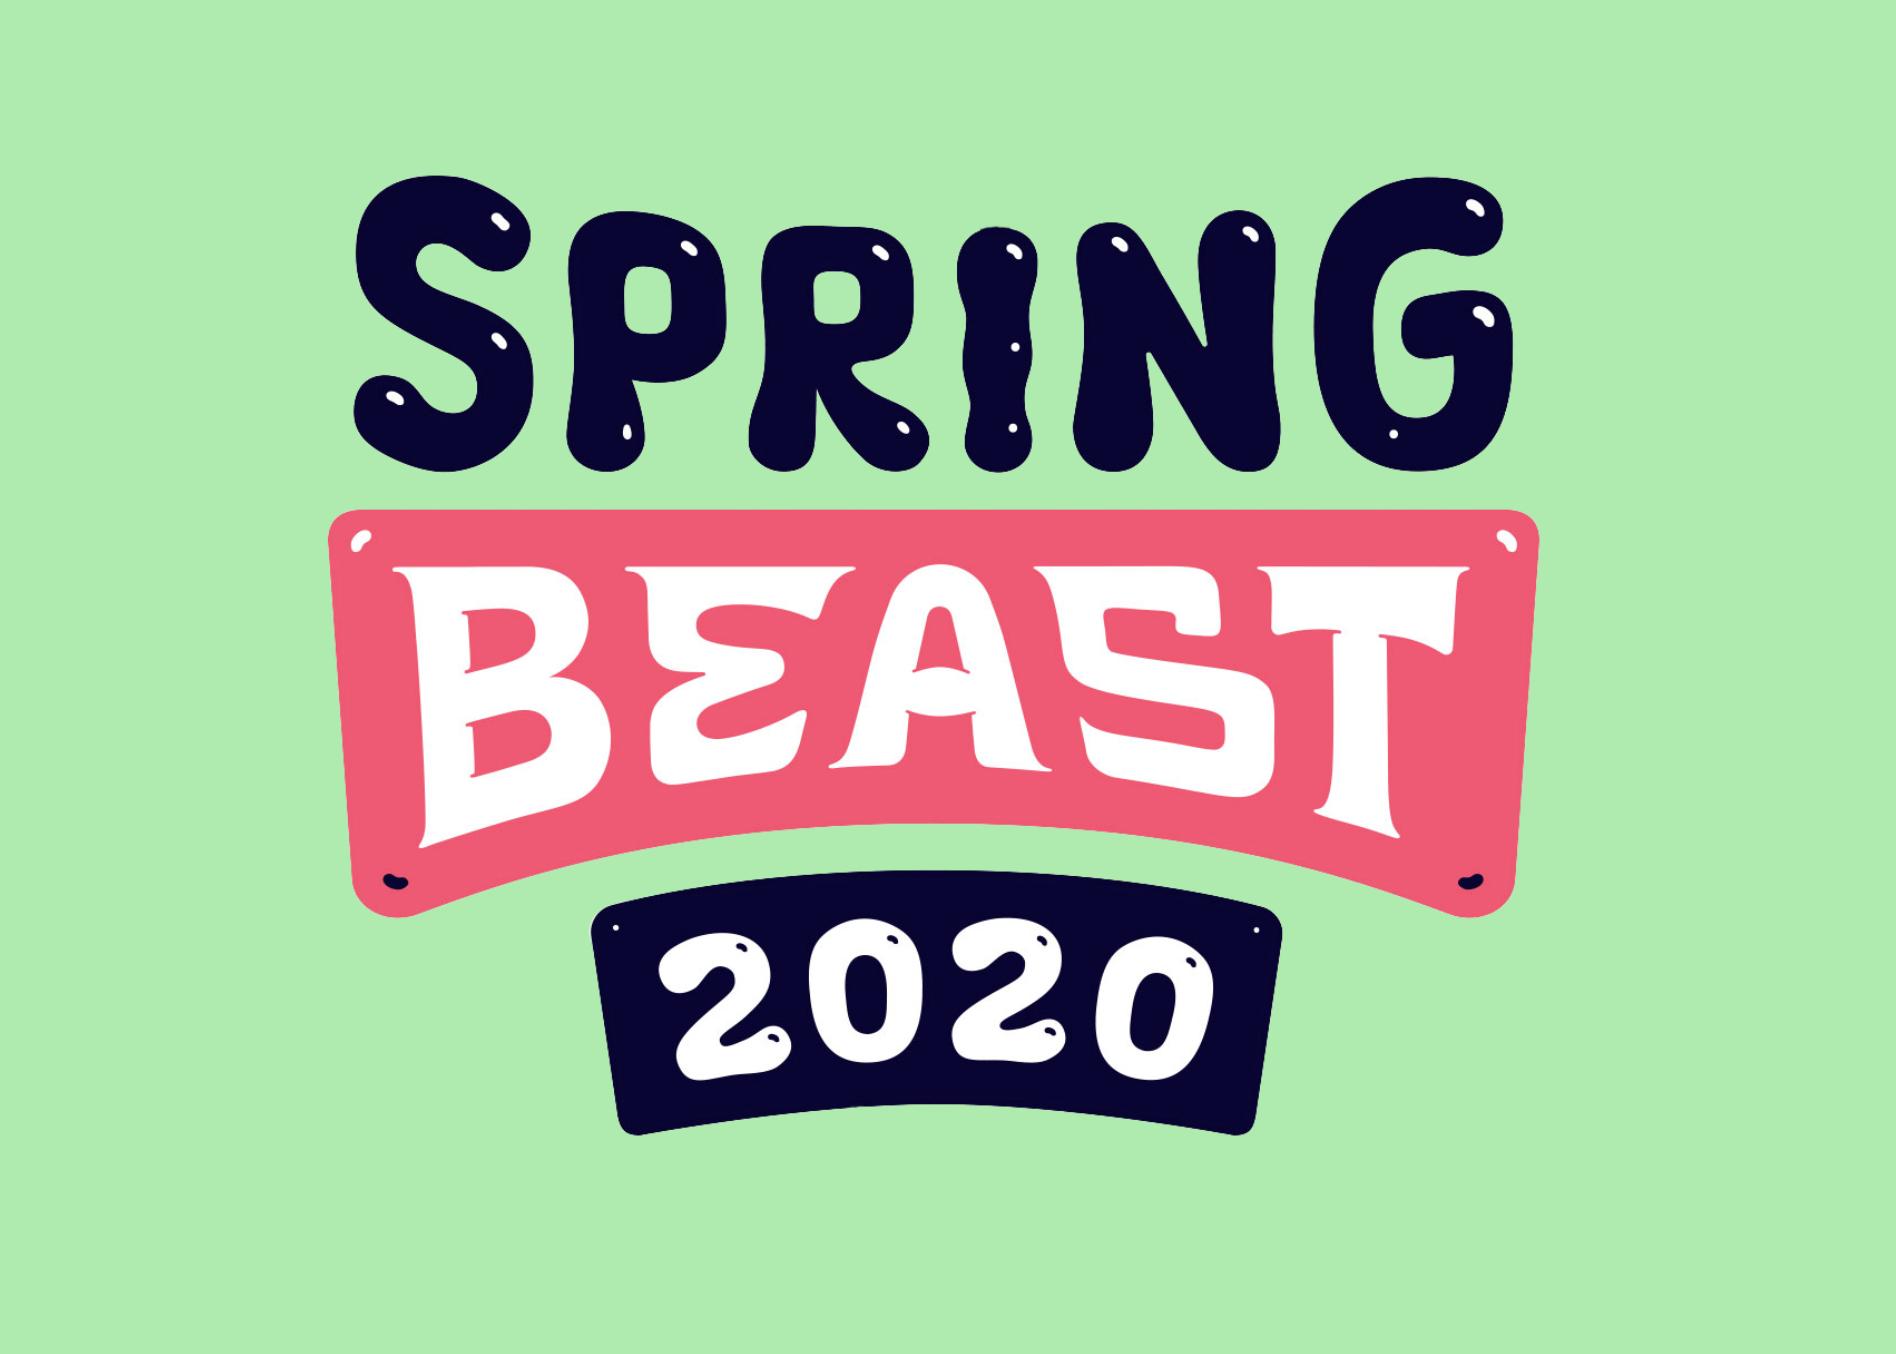 Spring Beast 2020